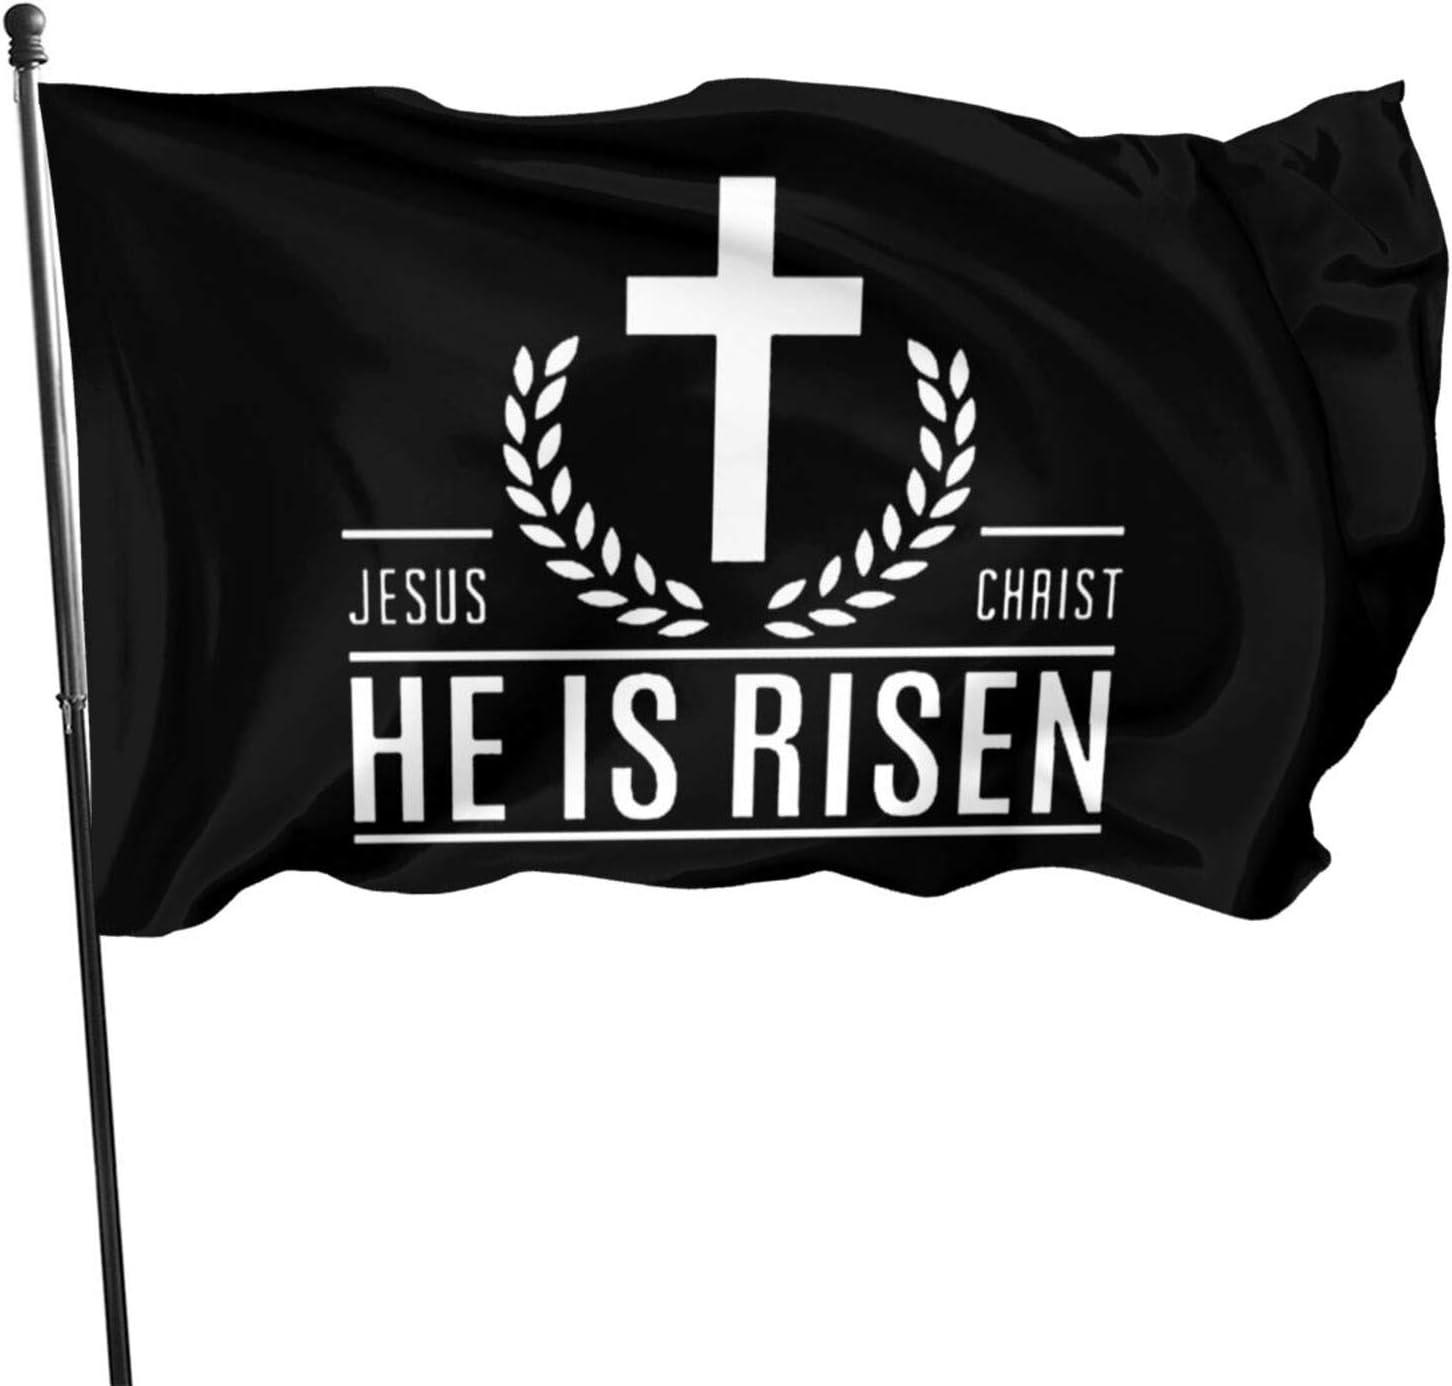 Iowajoji Jesus Christ He is Risen Christian Outdoor Banner Home Garden Flags Decorative Banner 3X5 Ft.